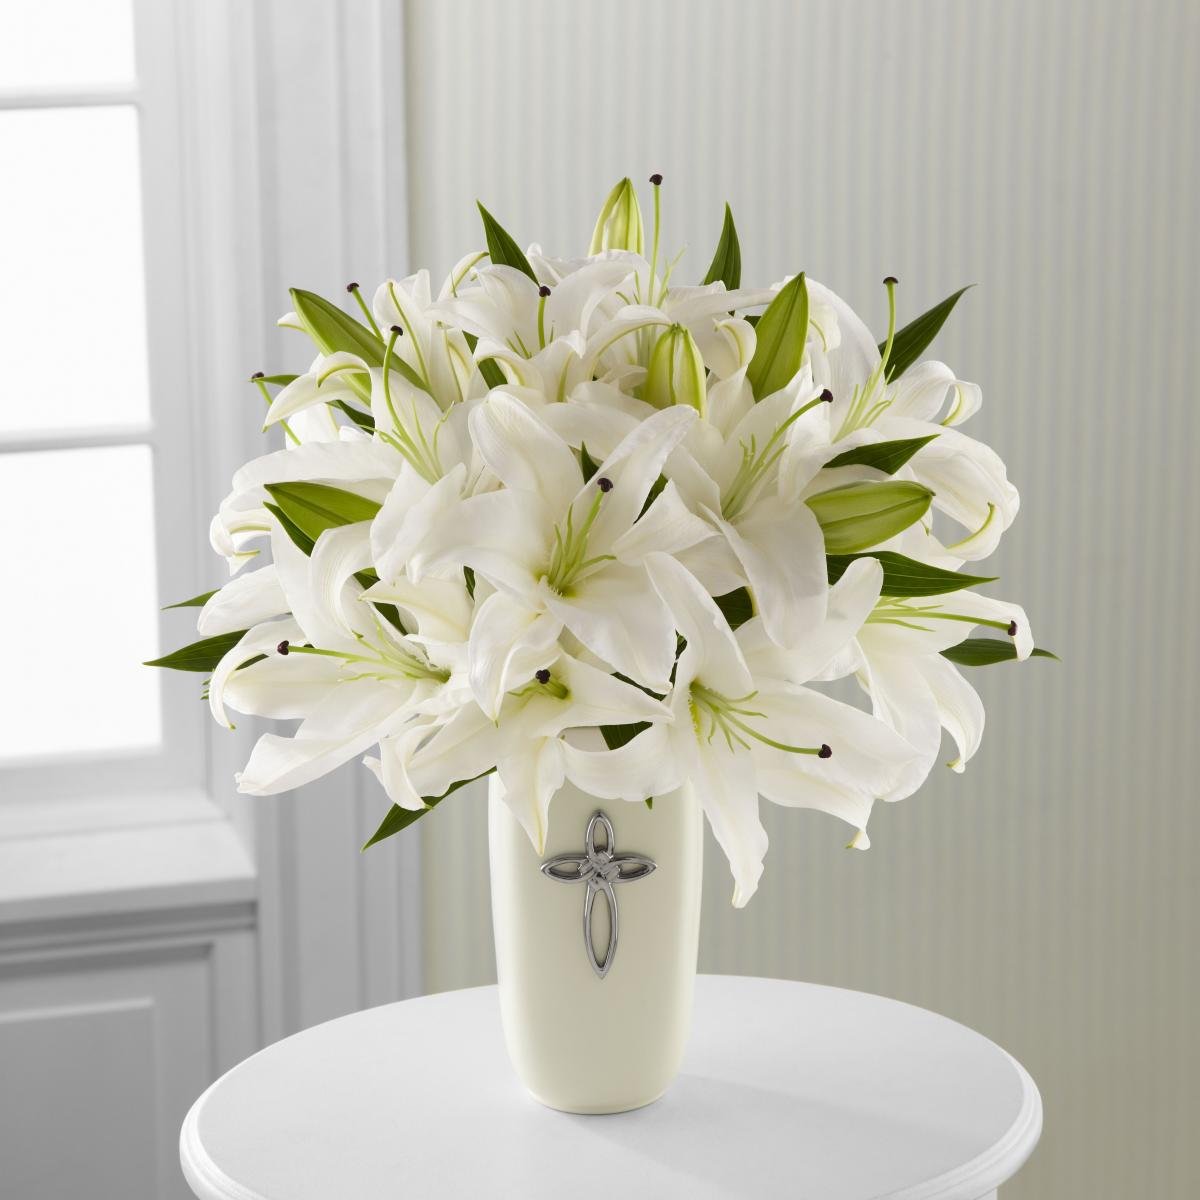 FTD® Faithful Blessings™ Bouquet